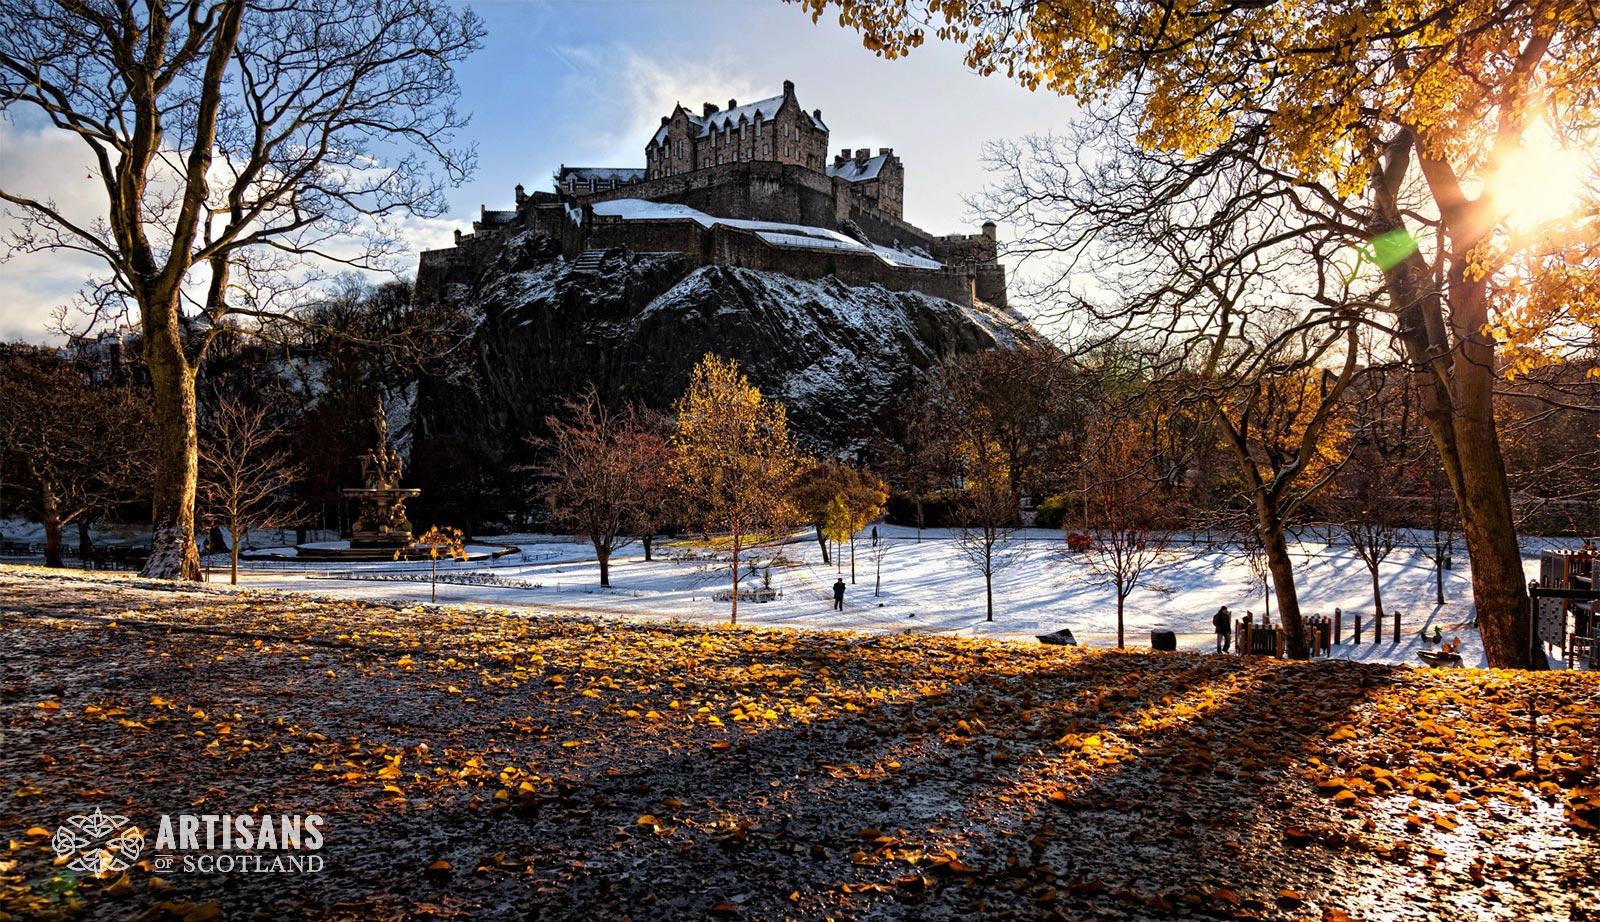 Edinburgh Castle - The most beautiful places in Scotland